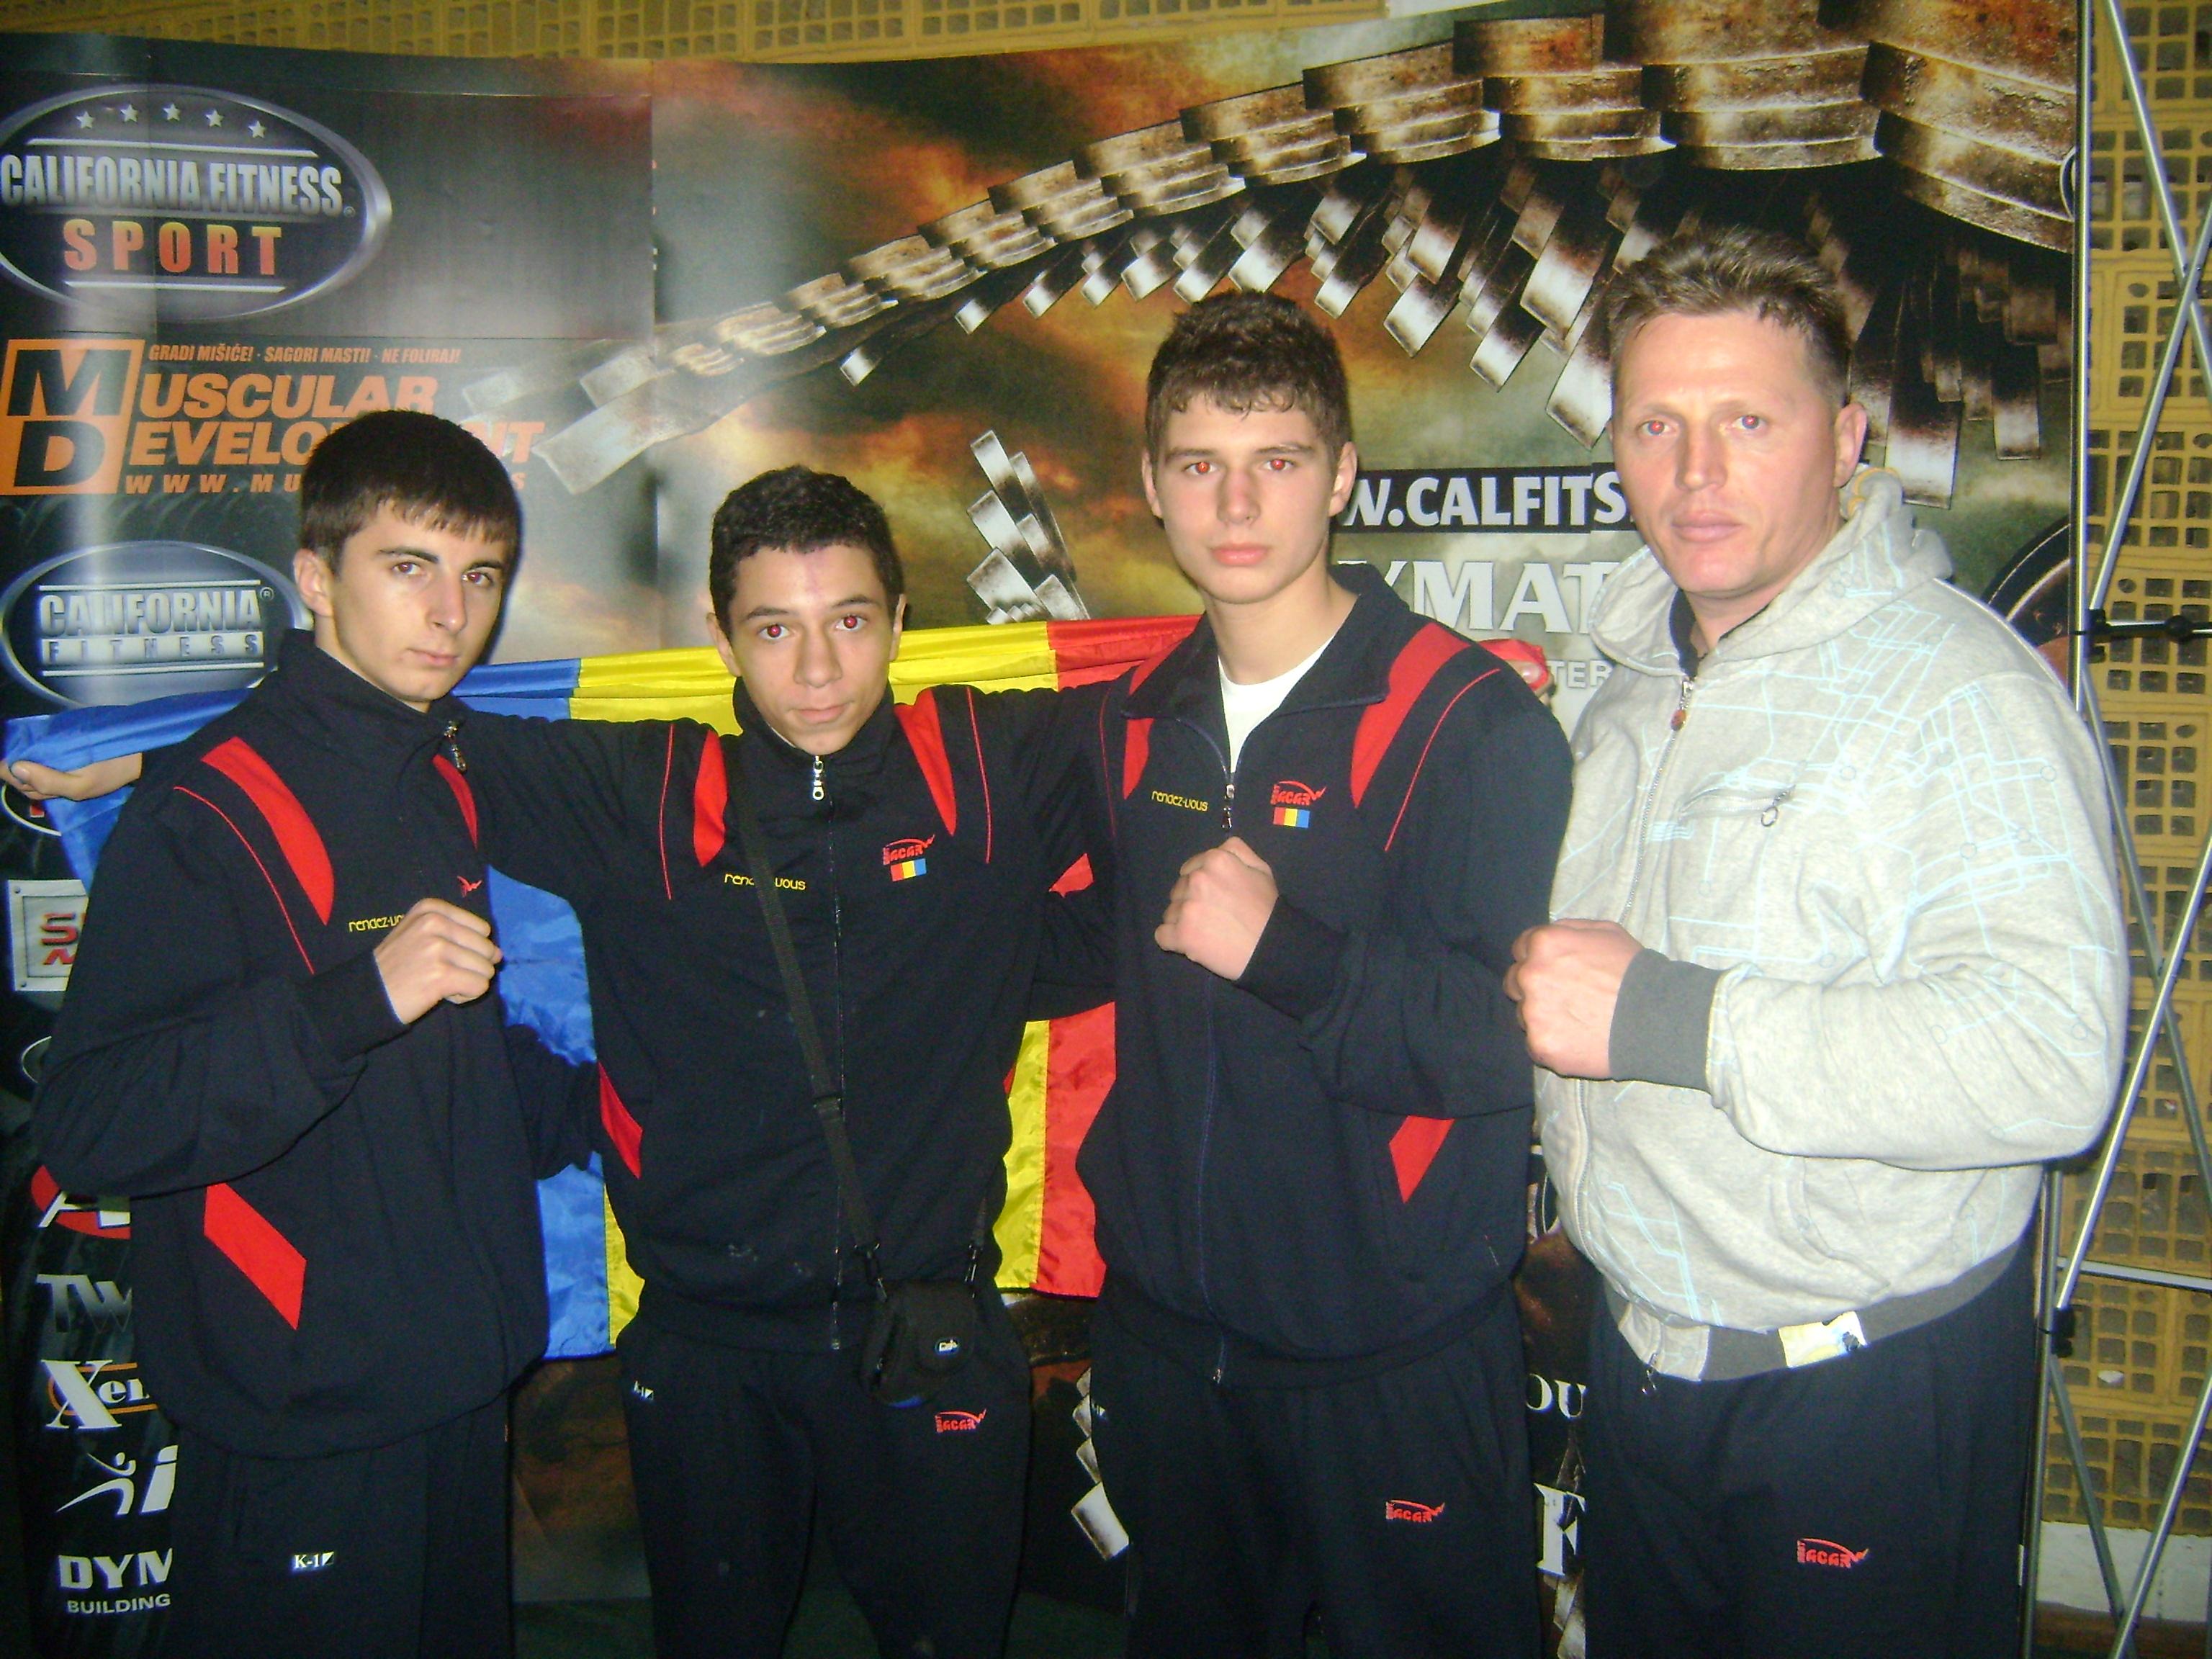 BPN 8 Serbia-Juniorii de la Power Gym medaliati cu AUR si ARGINT